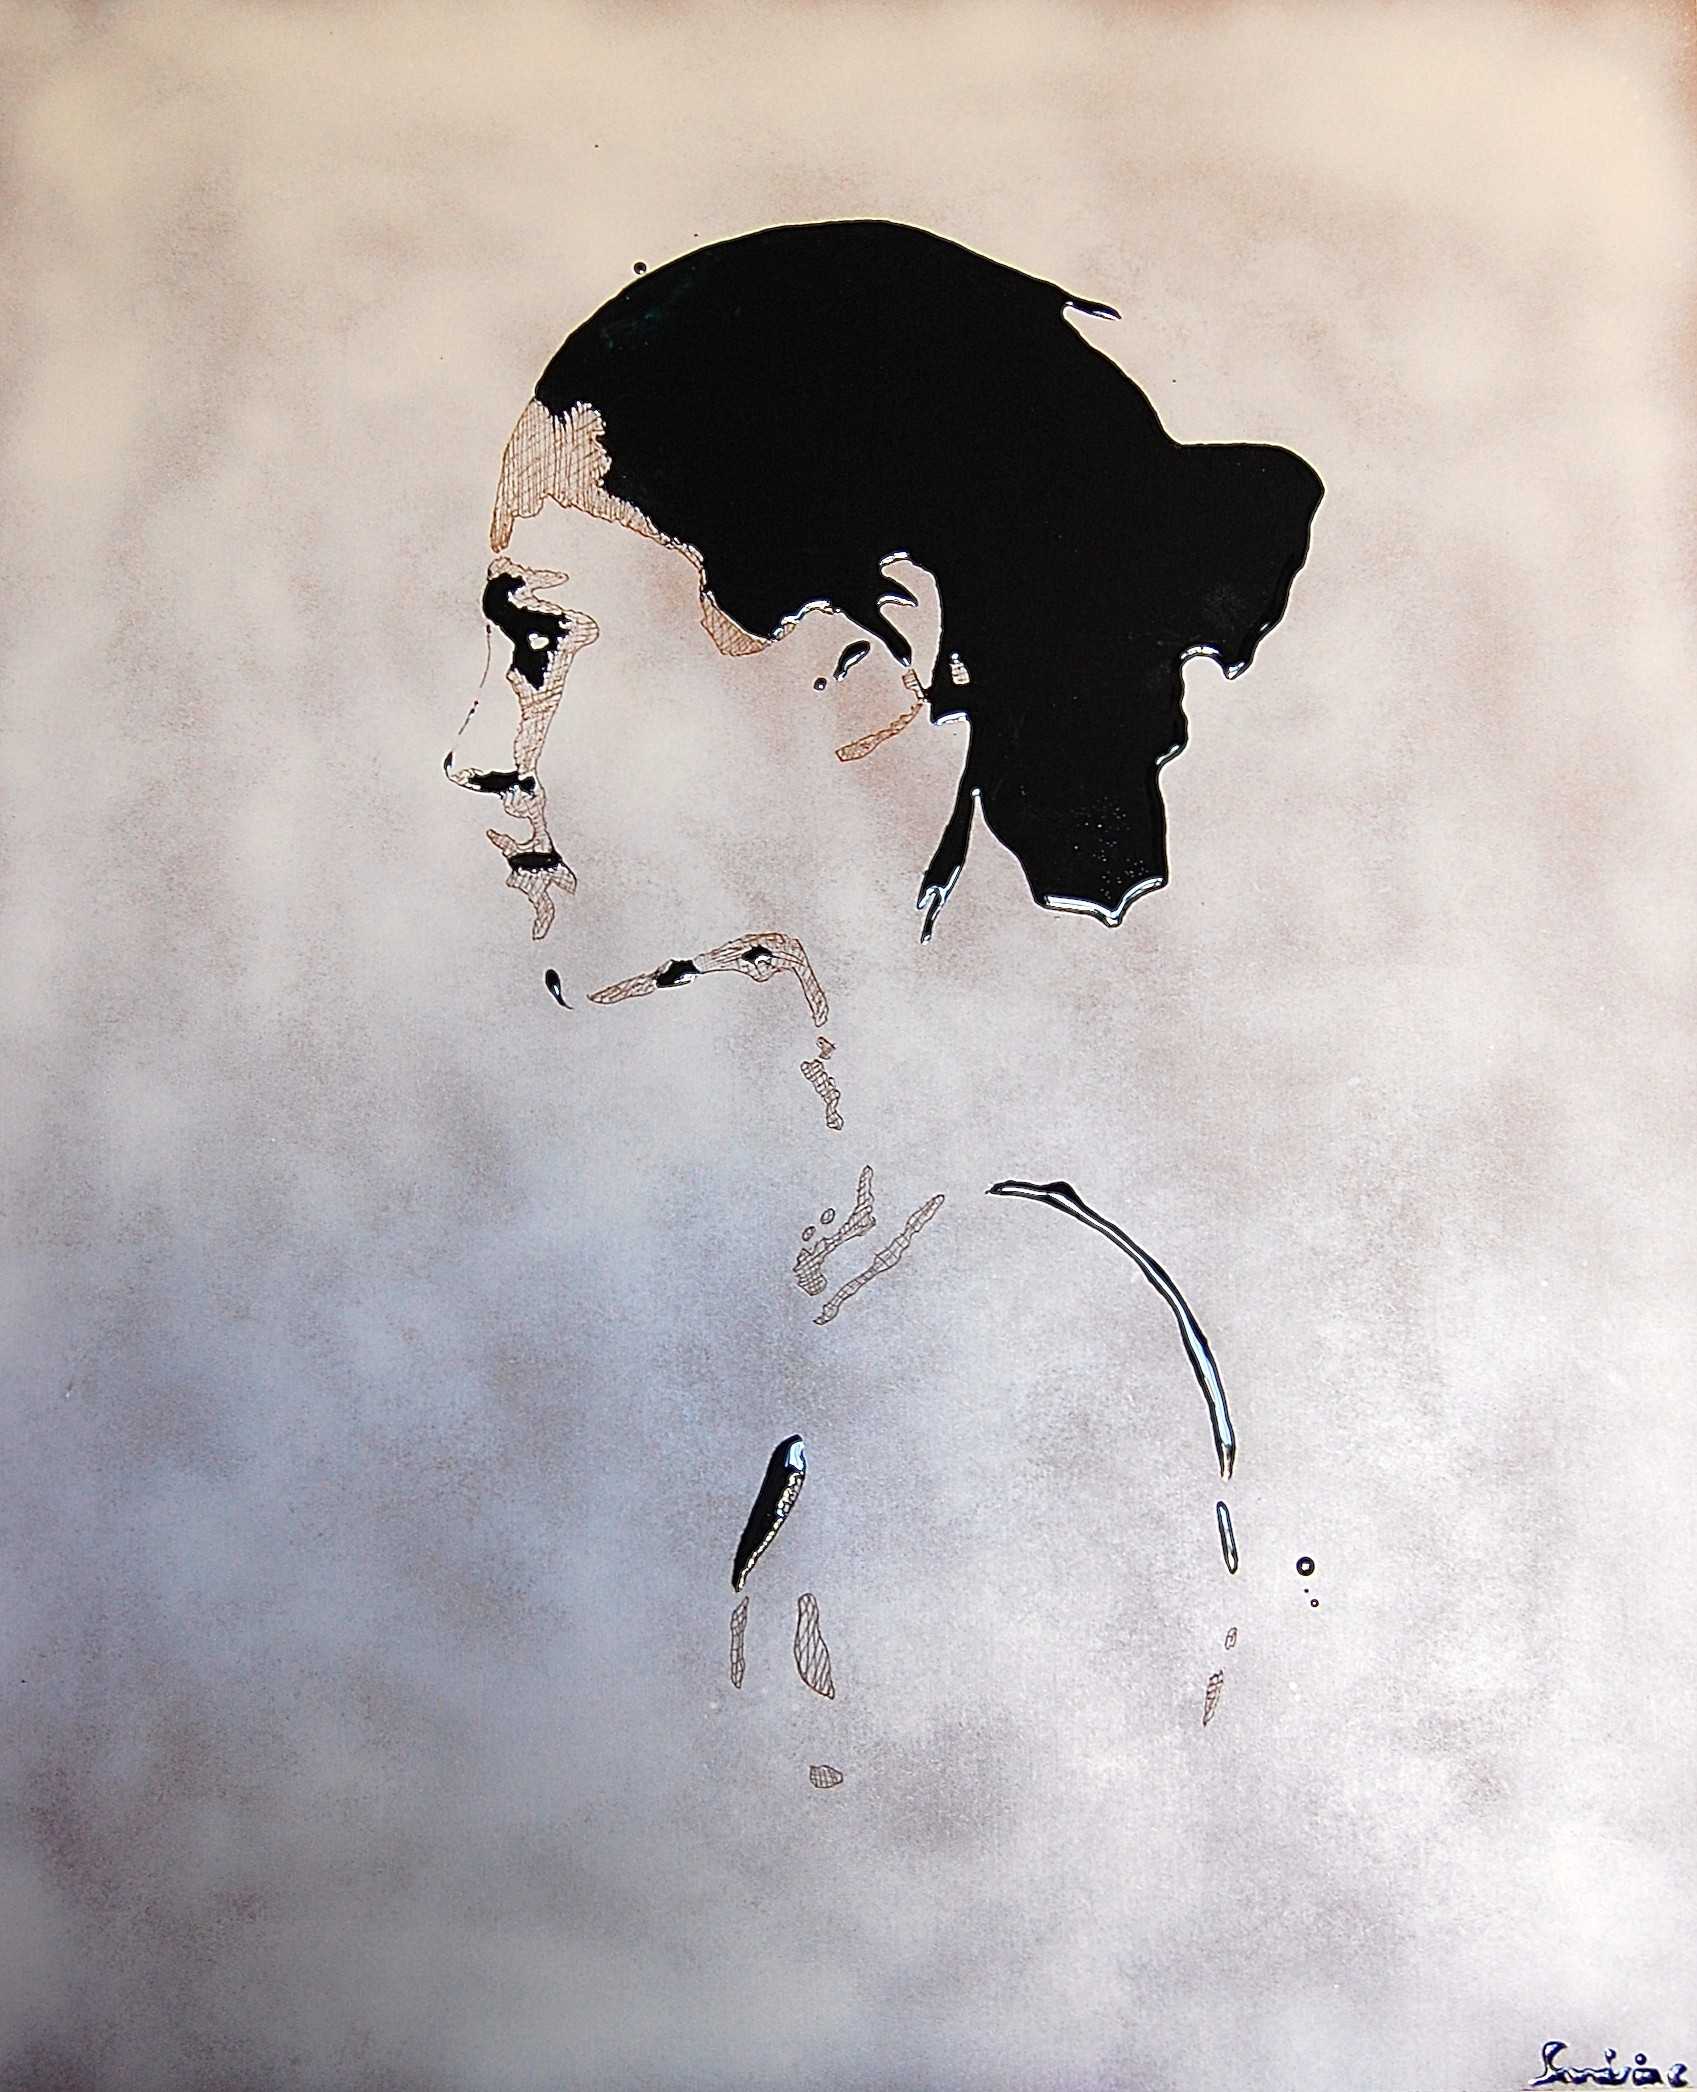 Attitude 4 - Sandrine M - KAZoART